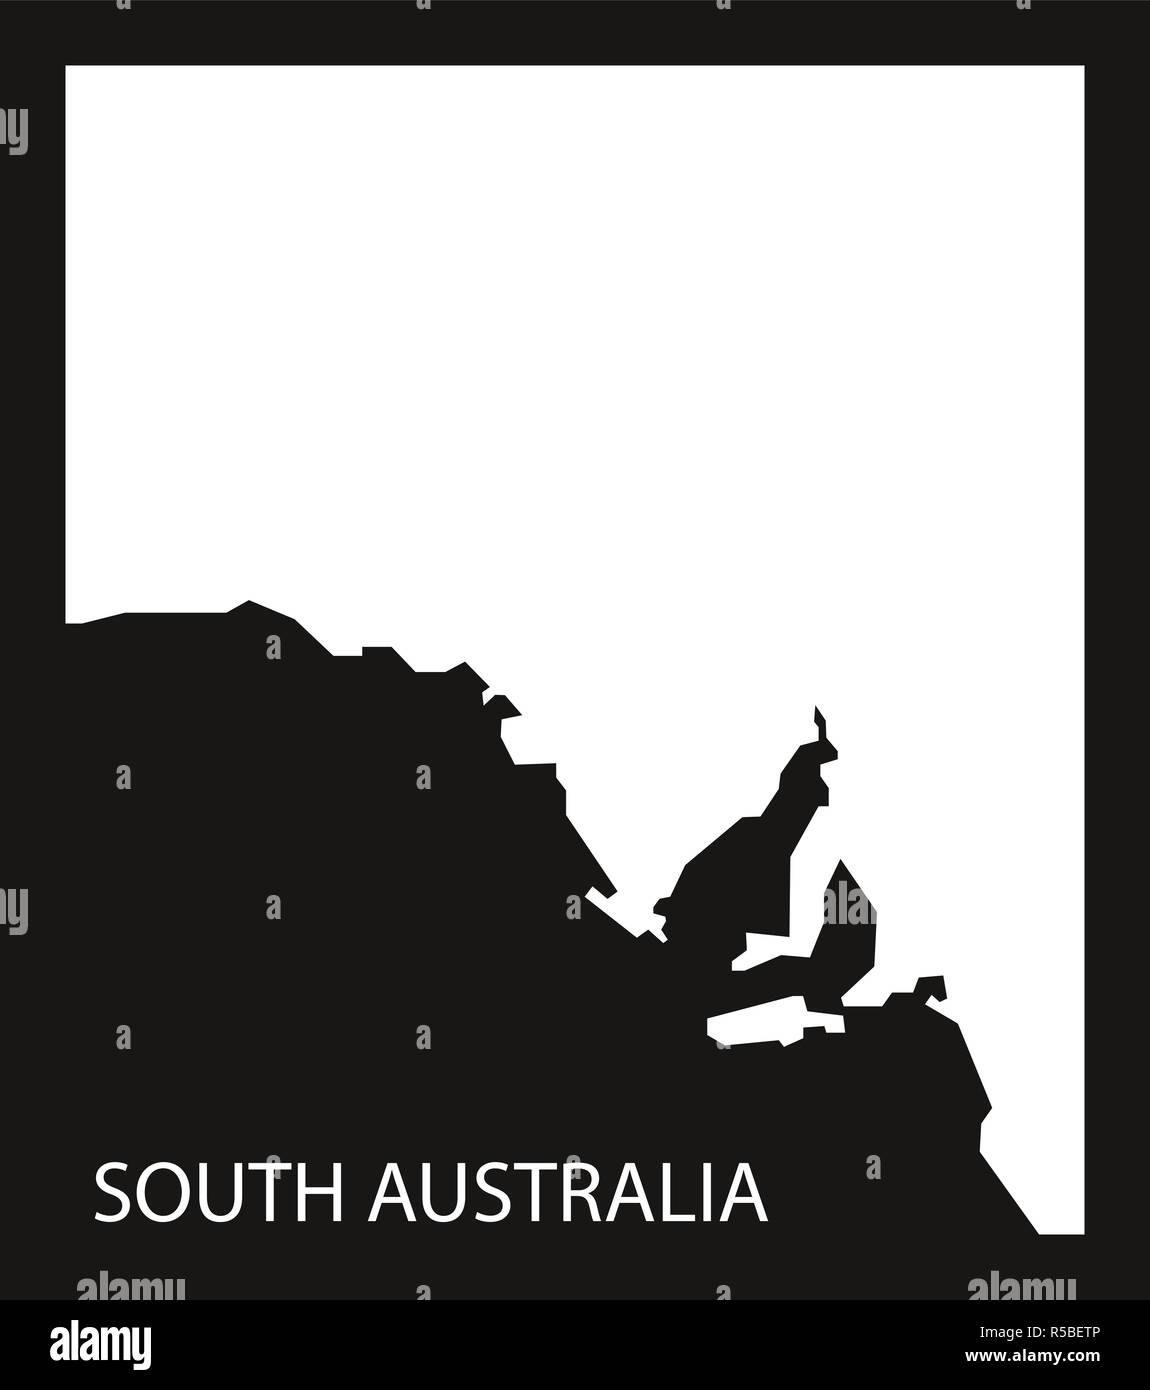 South Australia map black inverted silhouette illustration - Stock Image